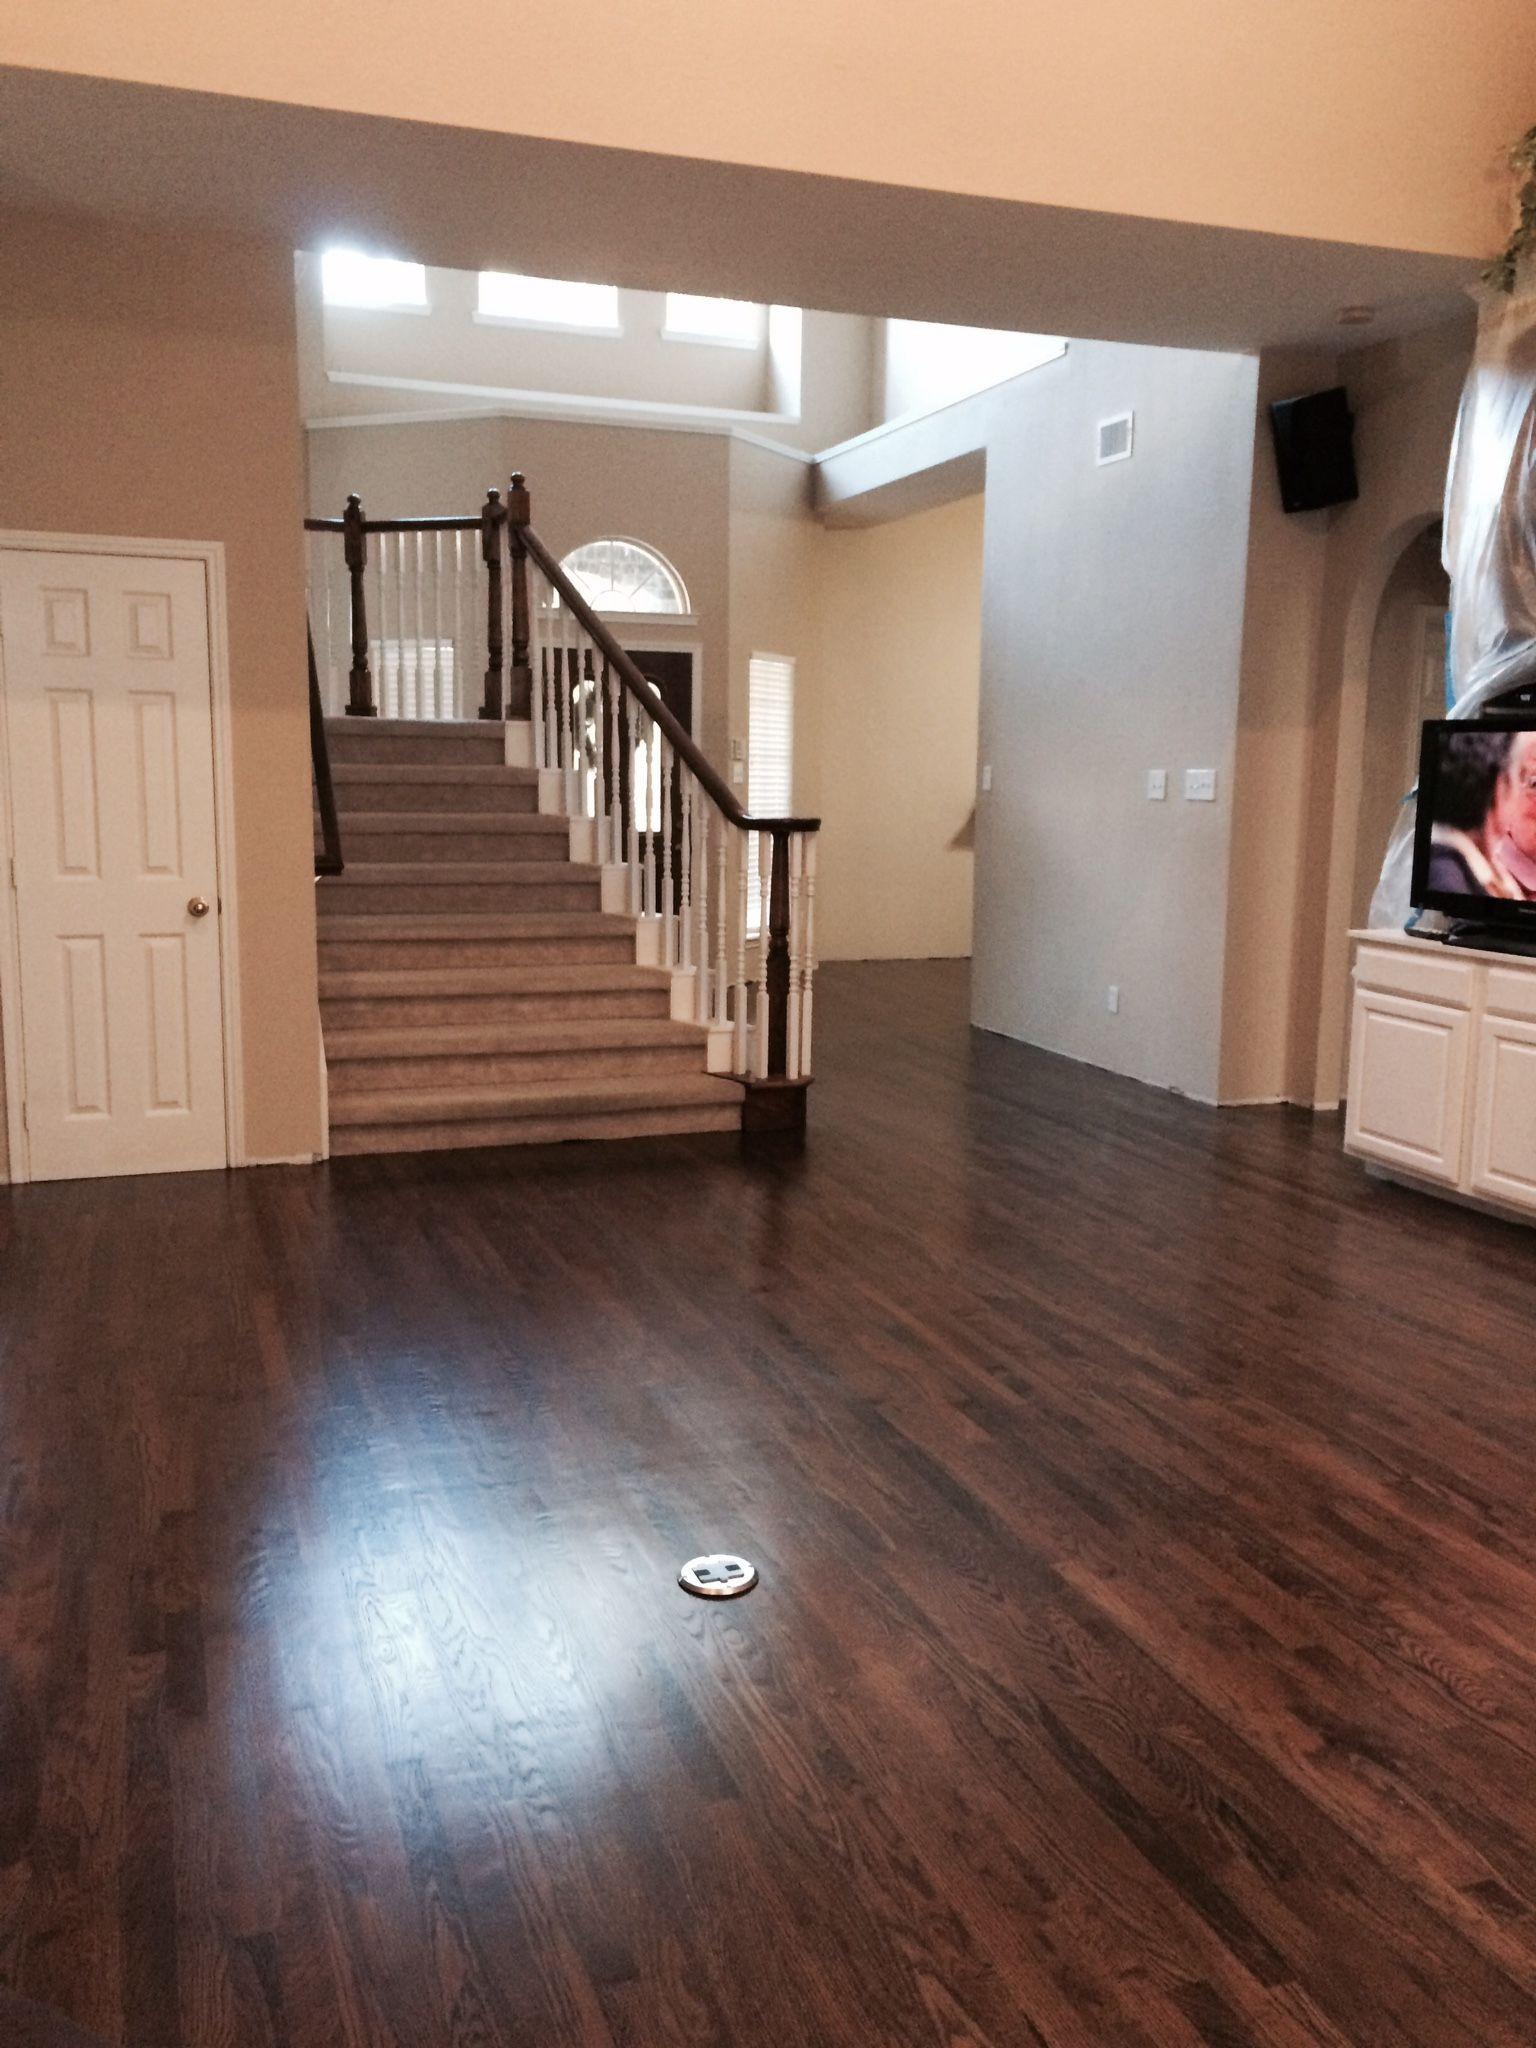 The Hardwood Flooring Company Reno Of Dark Walnut Stain On White Oak Hardwood Remodel 1floors In 2018 Regarding Dark Walnut Stain On White Oak Hardwood Walnut Hardwood Flooring Hardwood Floor Stain Colors